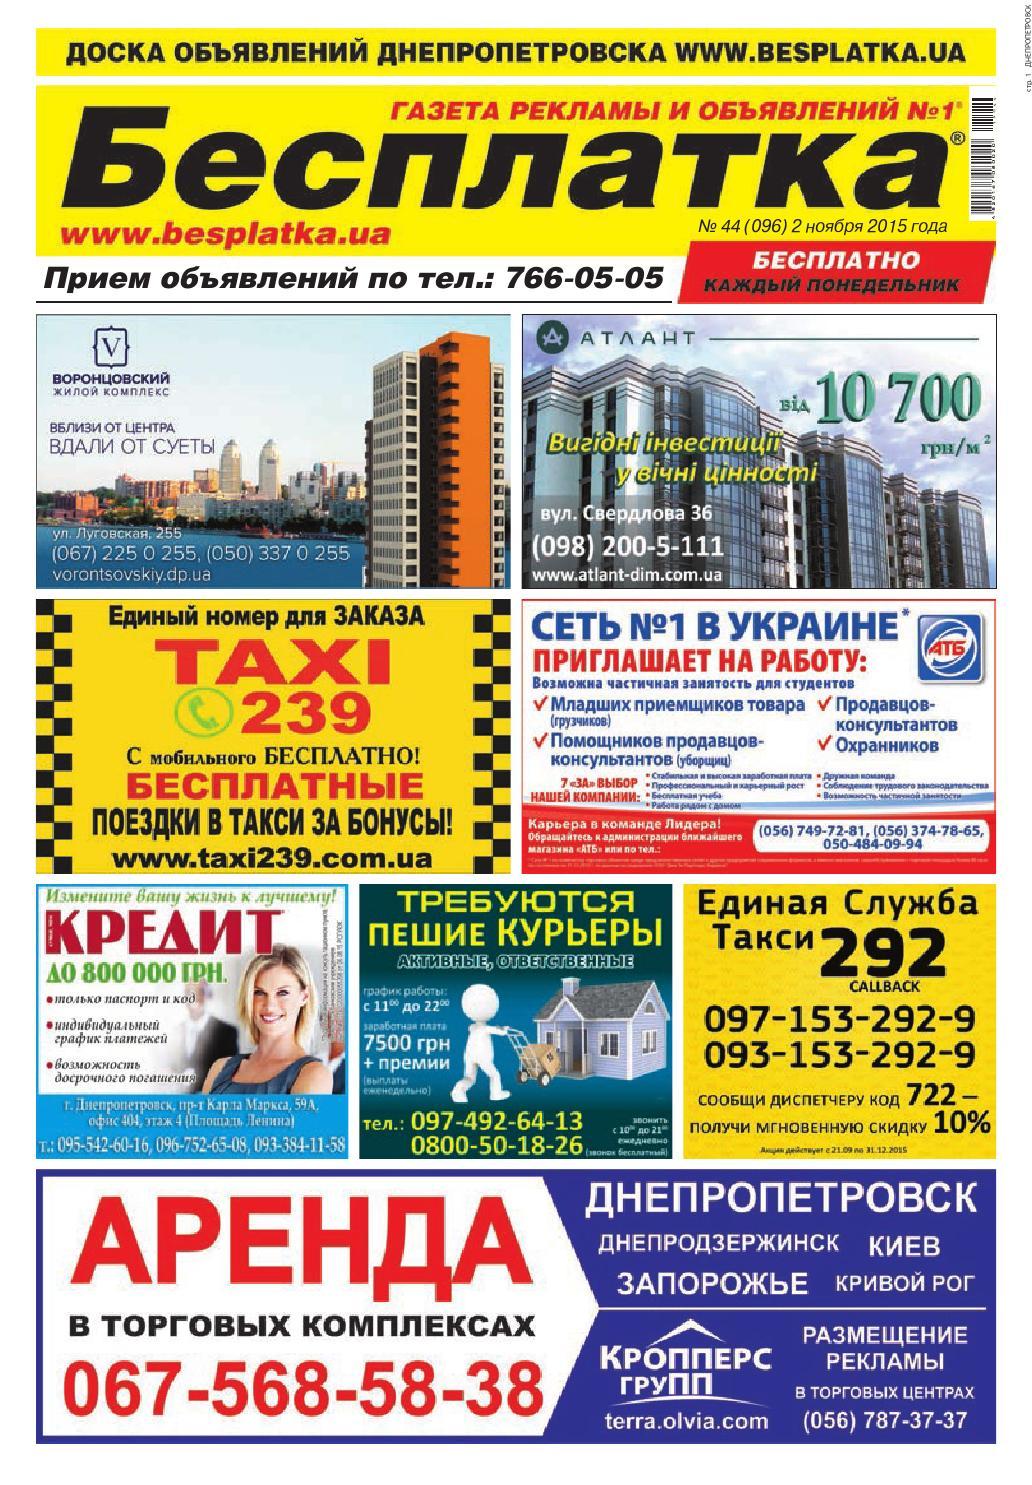 Besplatka  44 Днепропетровск by besplatka ukraine - issuu 39608dfd2b3